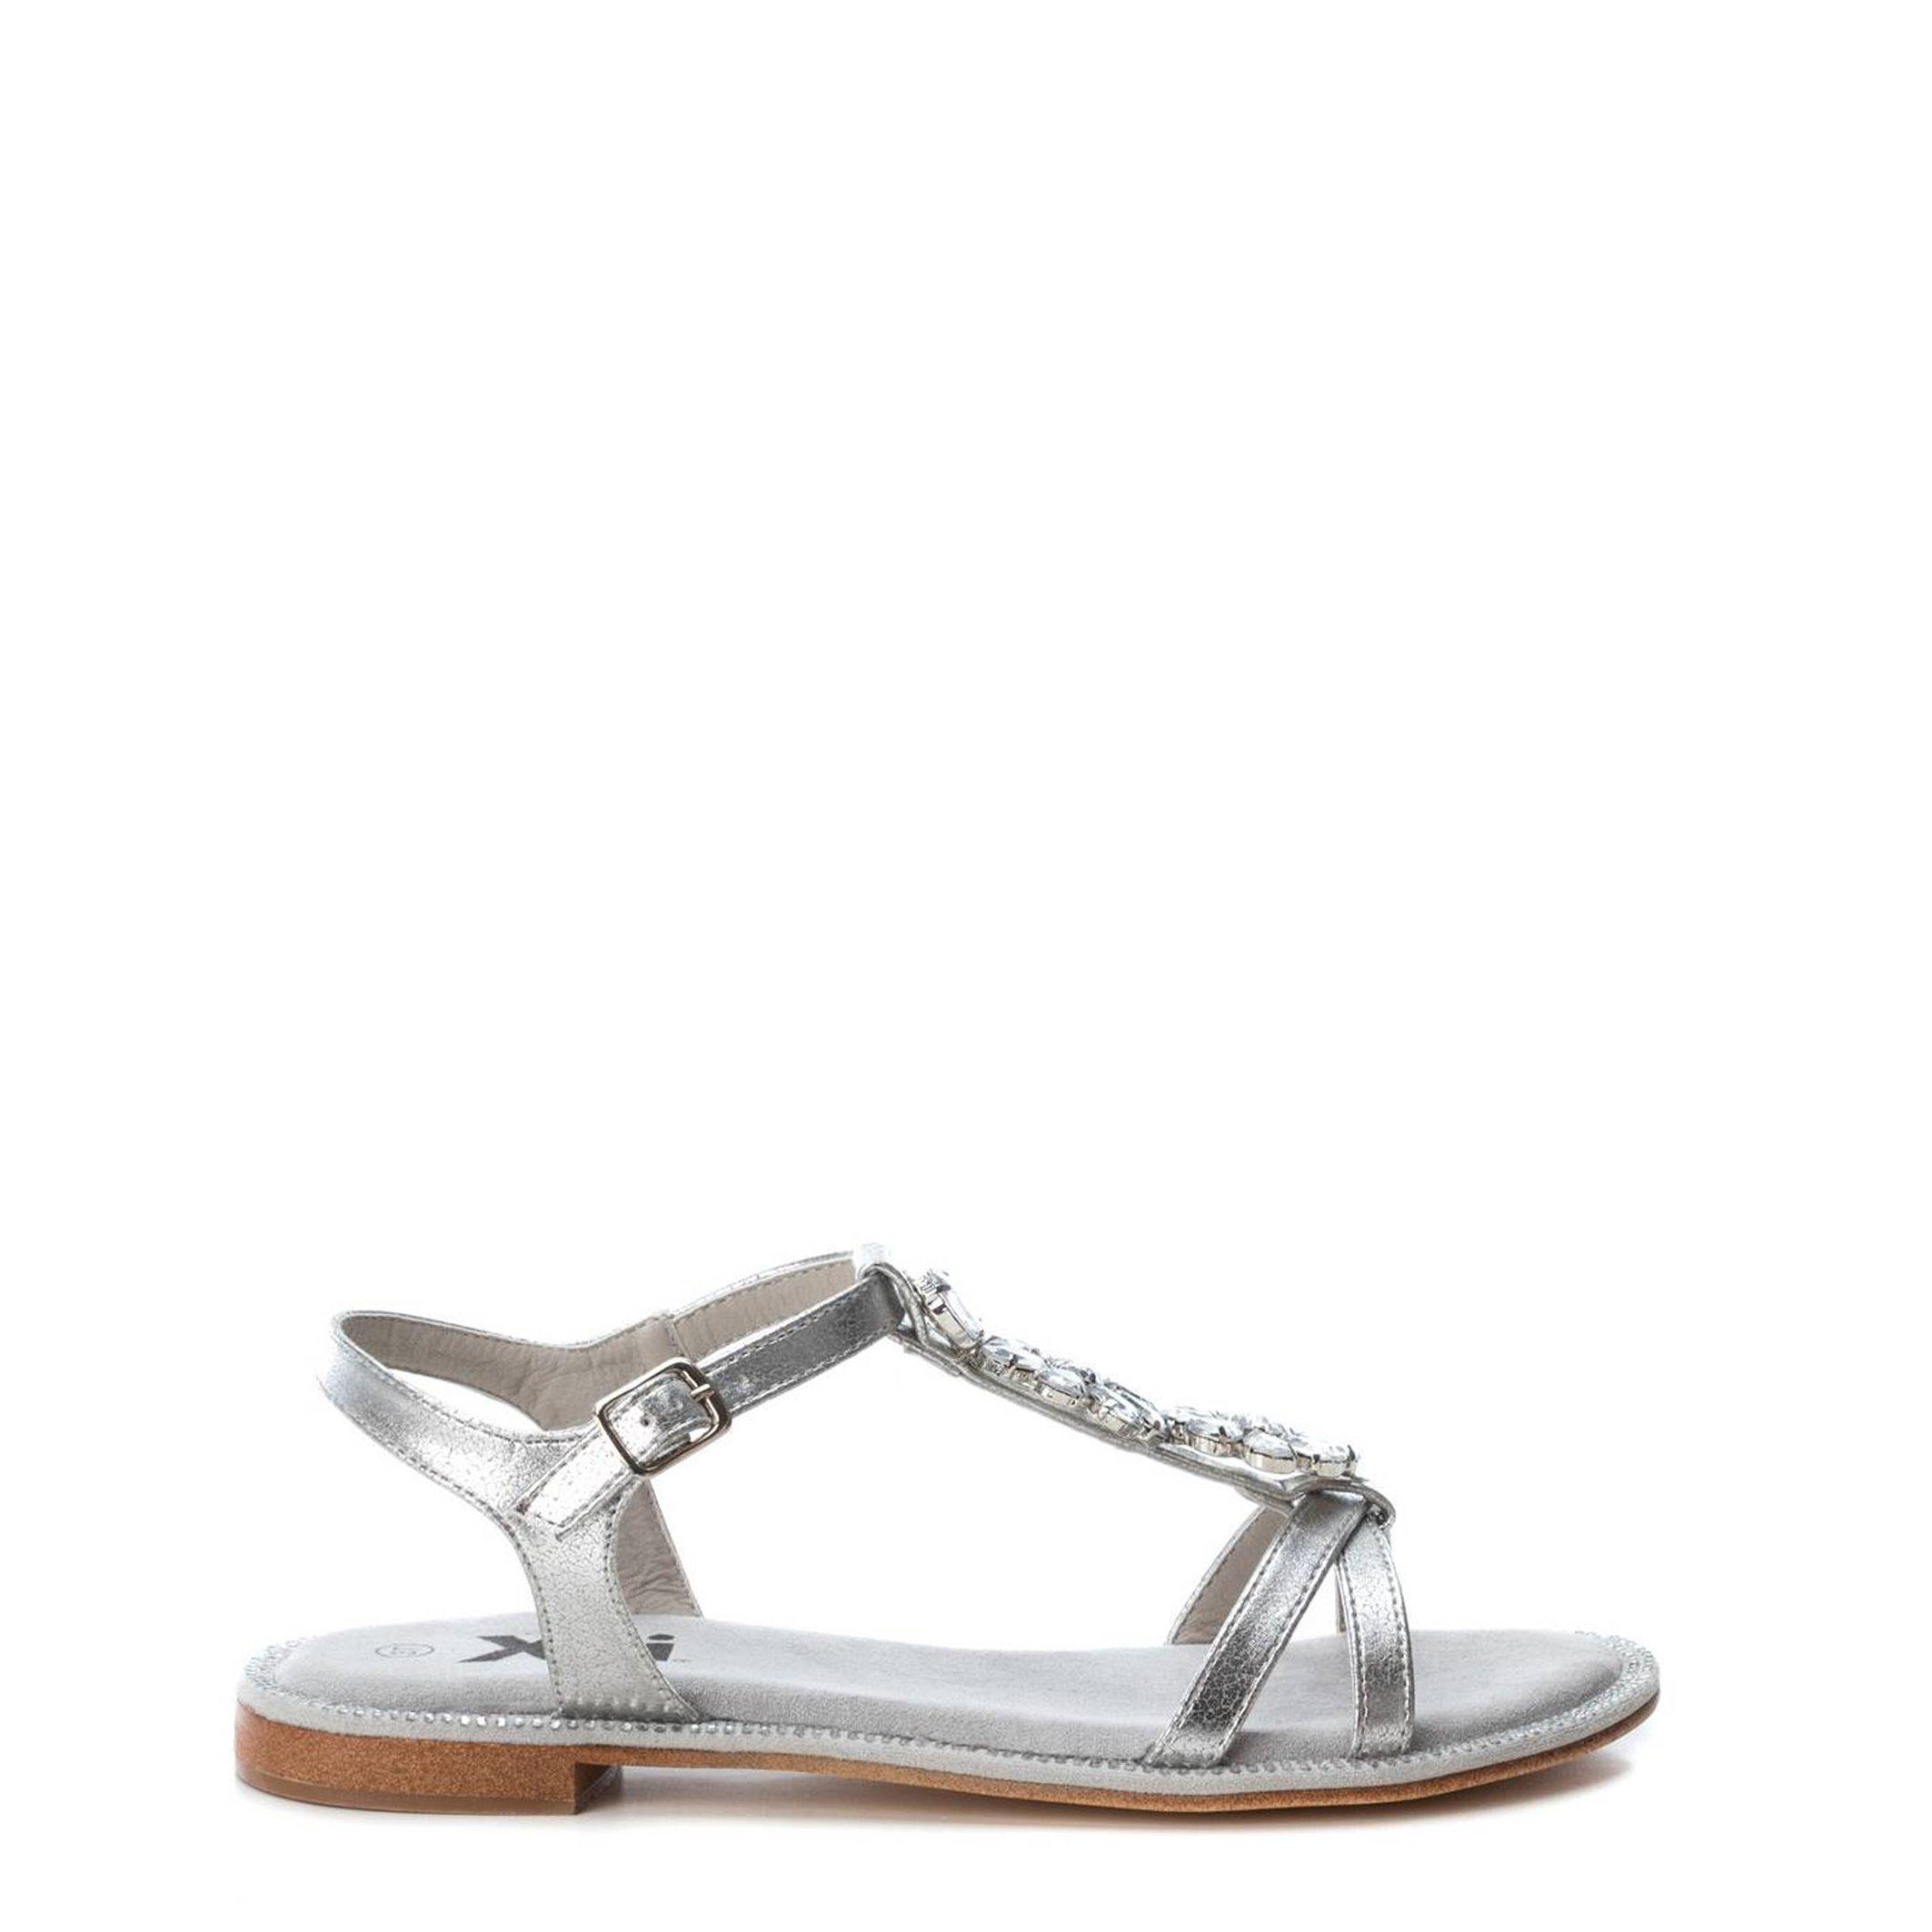 Xti Women's Sandals Various Colors 48995 - grey 35 EU